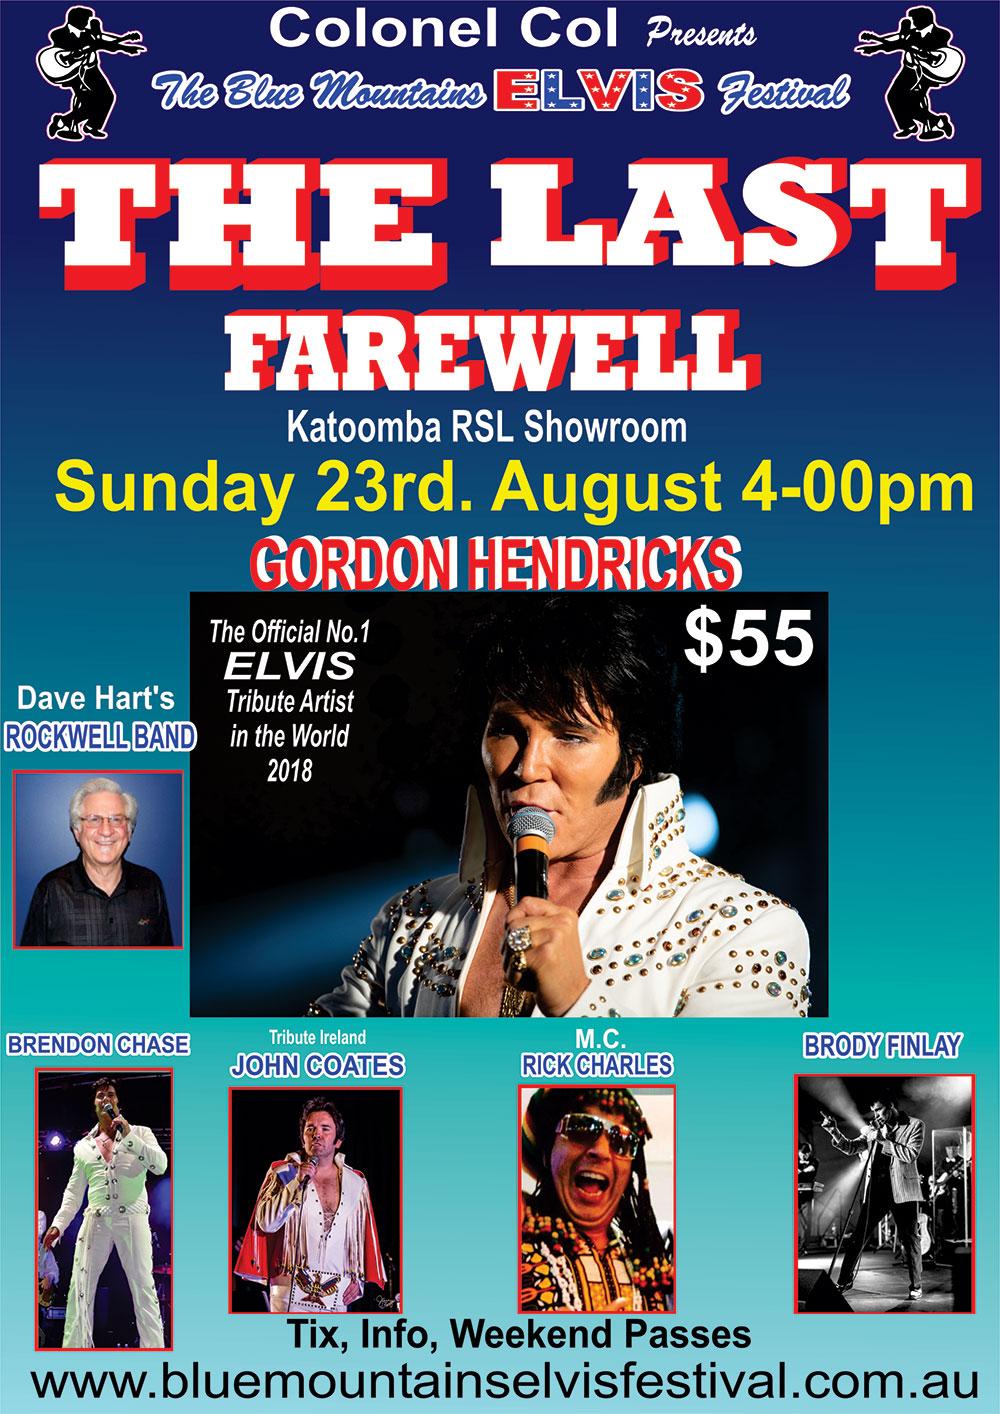 Last-Farewell